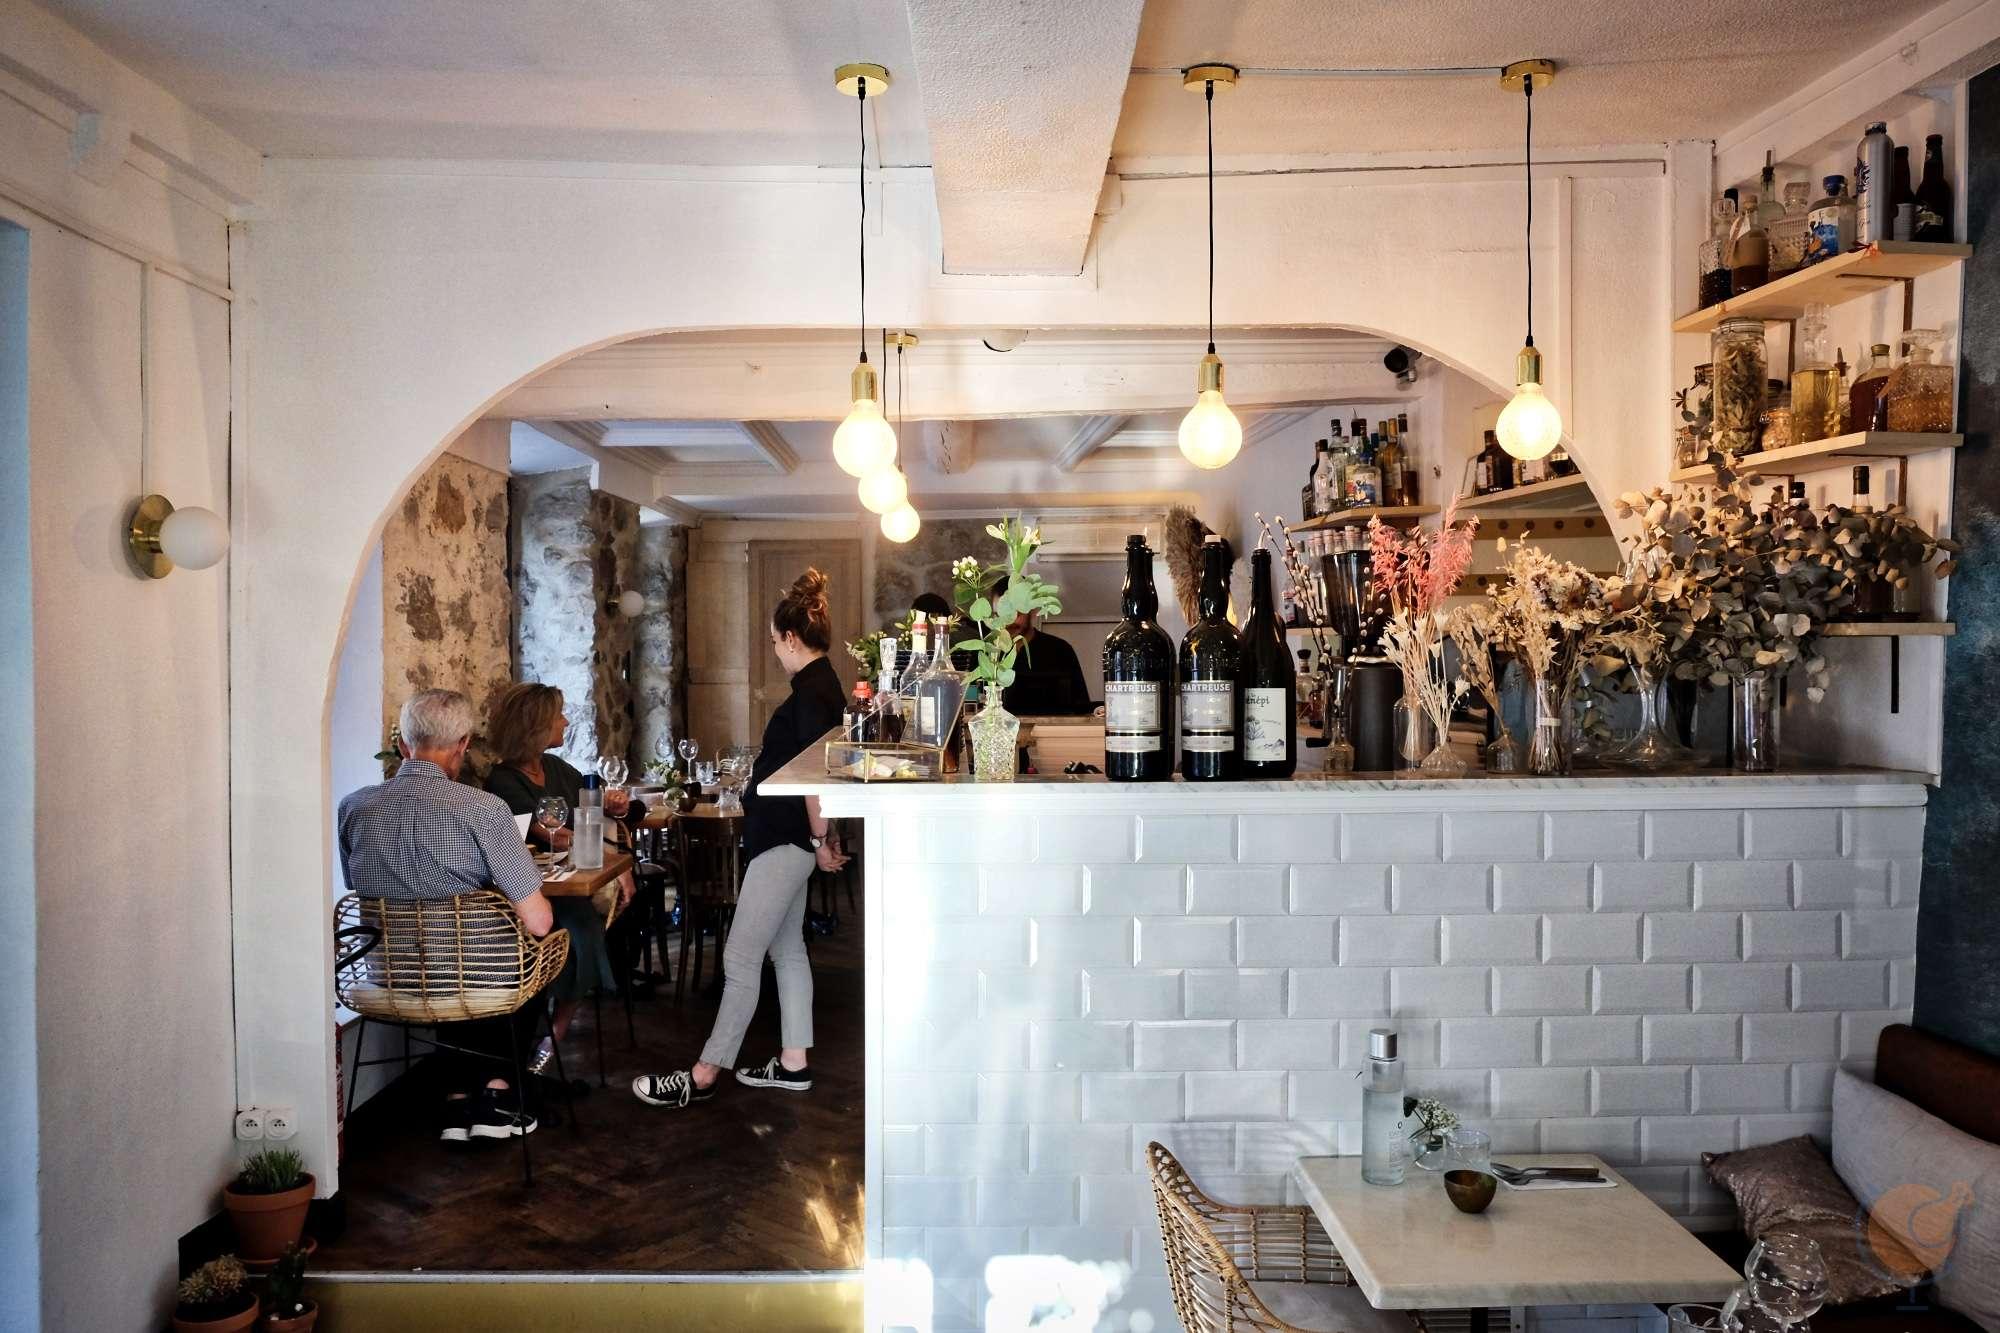 dscf1345_les_agitateurs_restaurant_france_nice_nizza_vilagevo_jokuti_andras_l_w.jpg